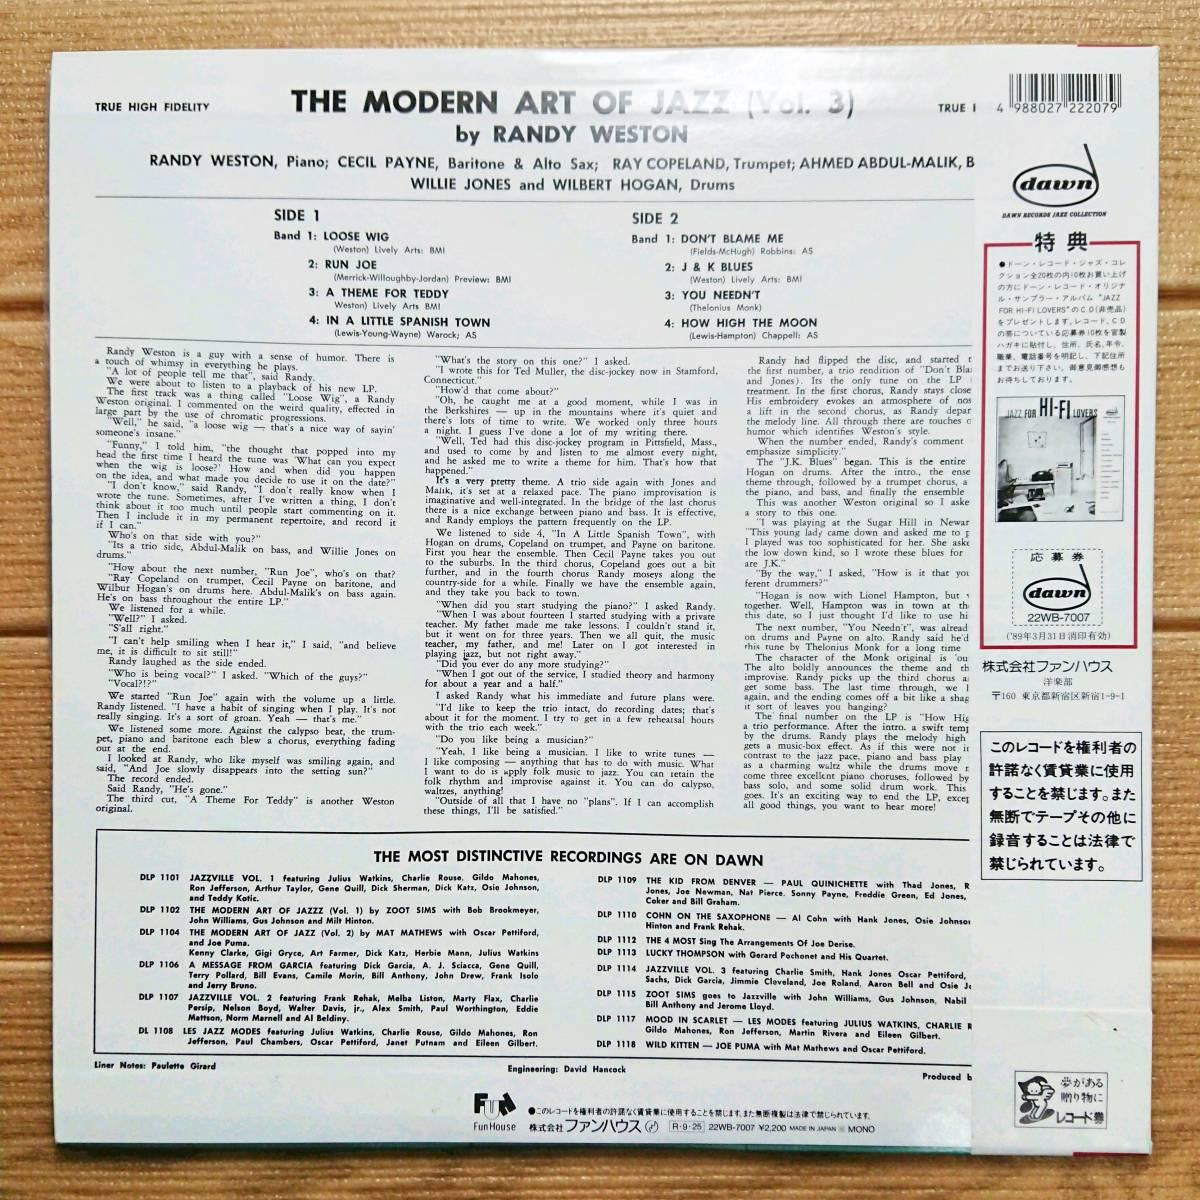 Randy Weston(p)/The Modern Art Of Jazz Vol.3 ランディ・ウエストン(p)/モダン・アート・オブ・ジャズ Vol.3【国内帯付重量盤美盤】_画像2